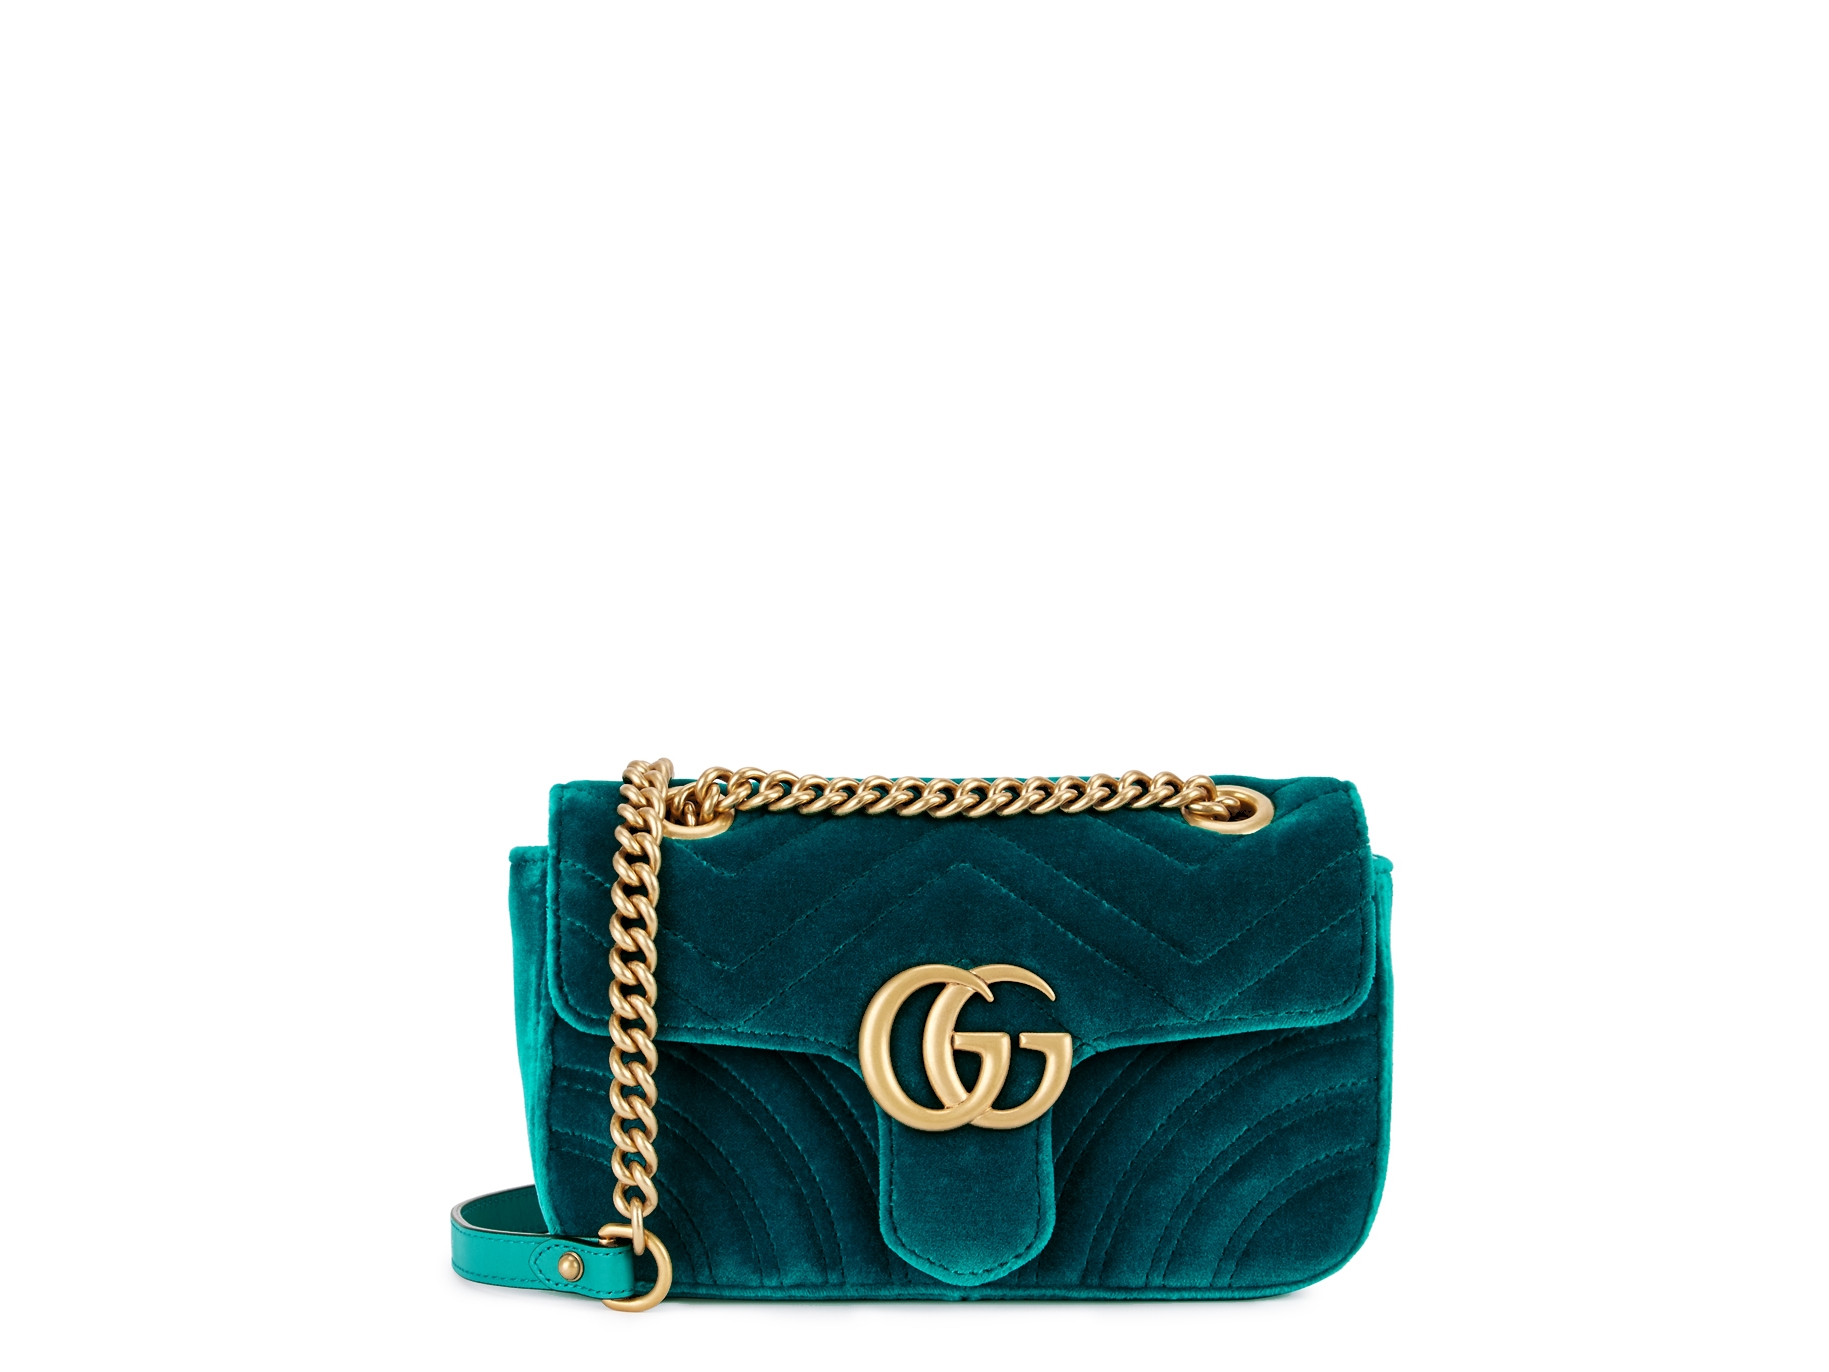 164651ddff2f Gucci GG Marmont mini velvet shoulder bag - Harvey Nichols